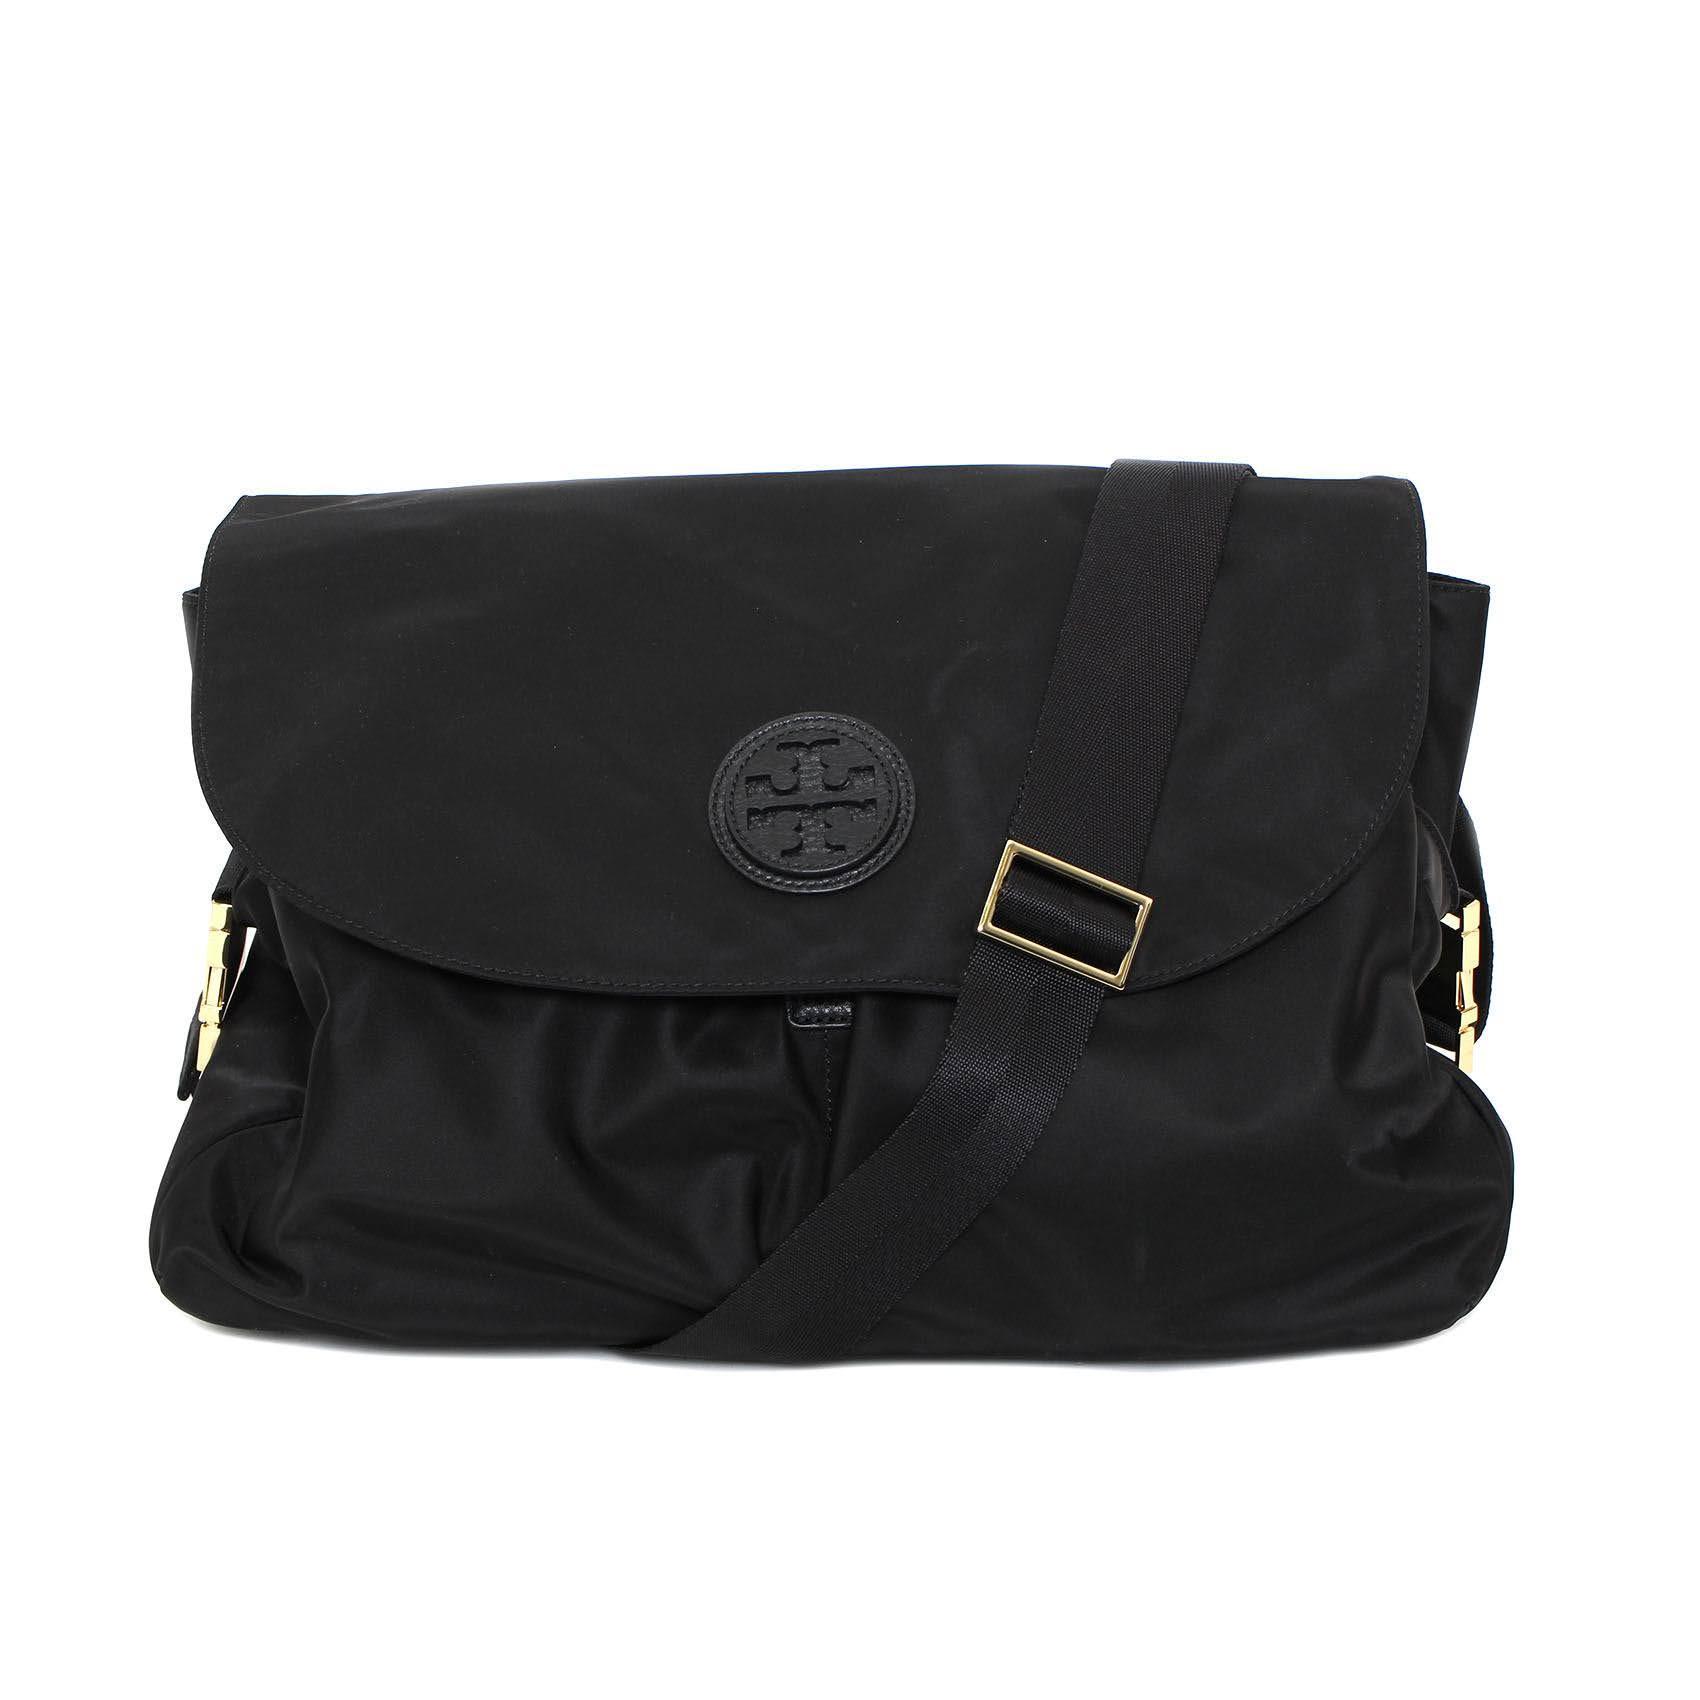 Tory Burch Nylon Baby Bag